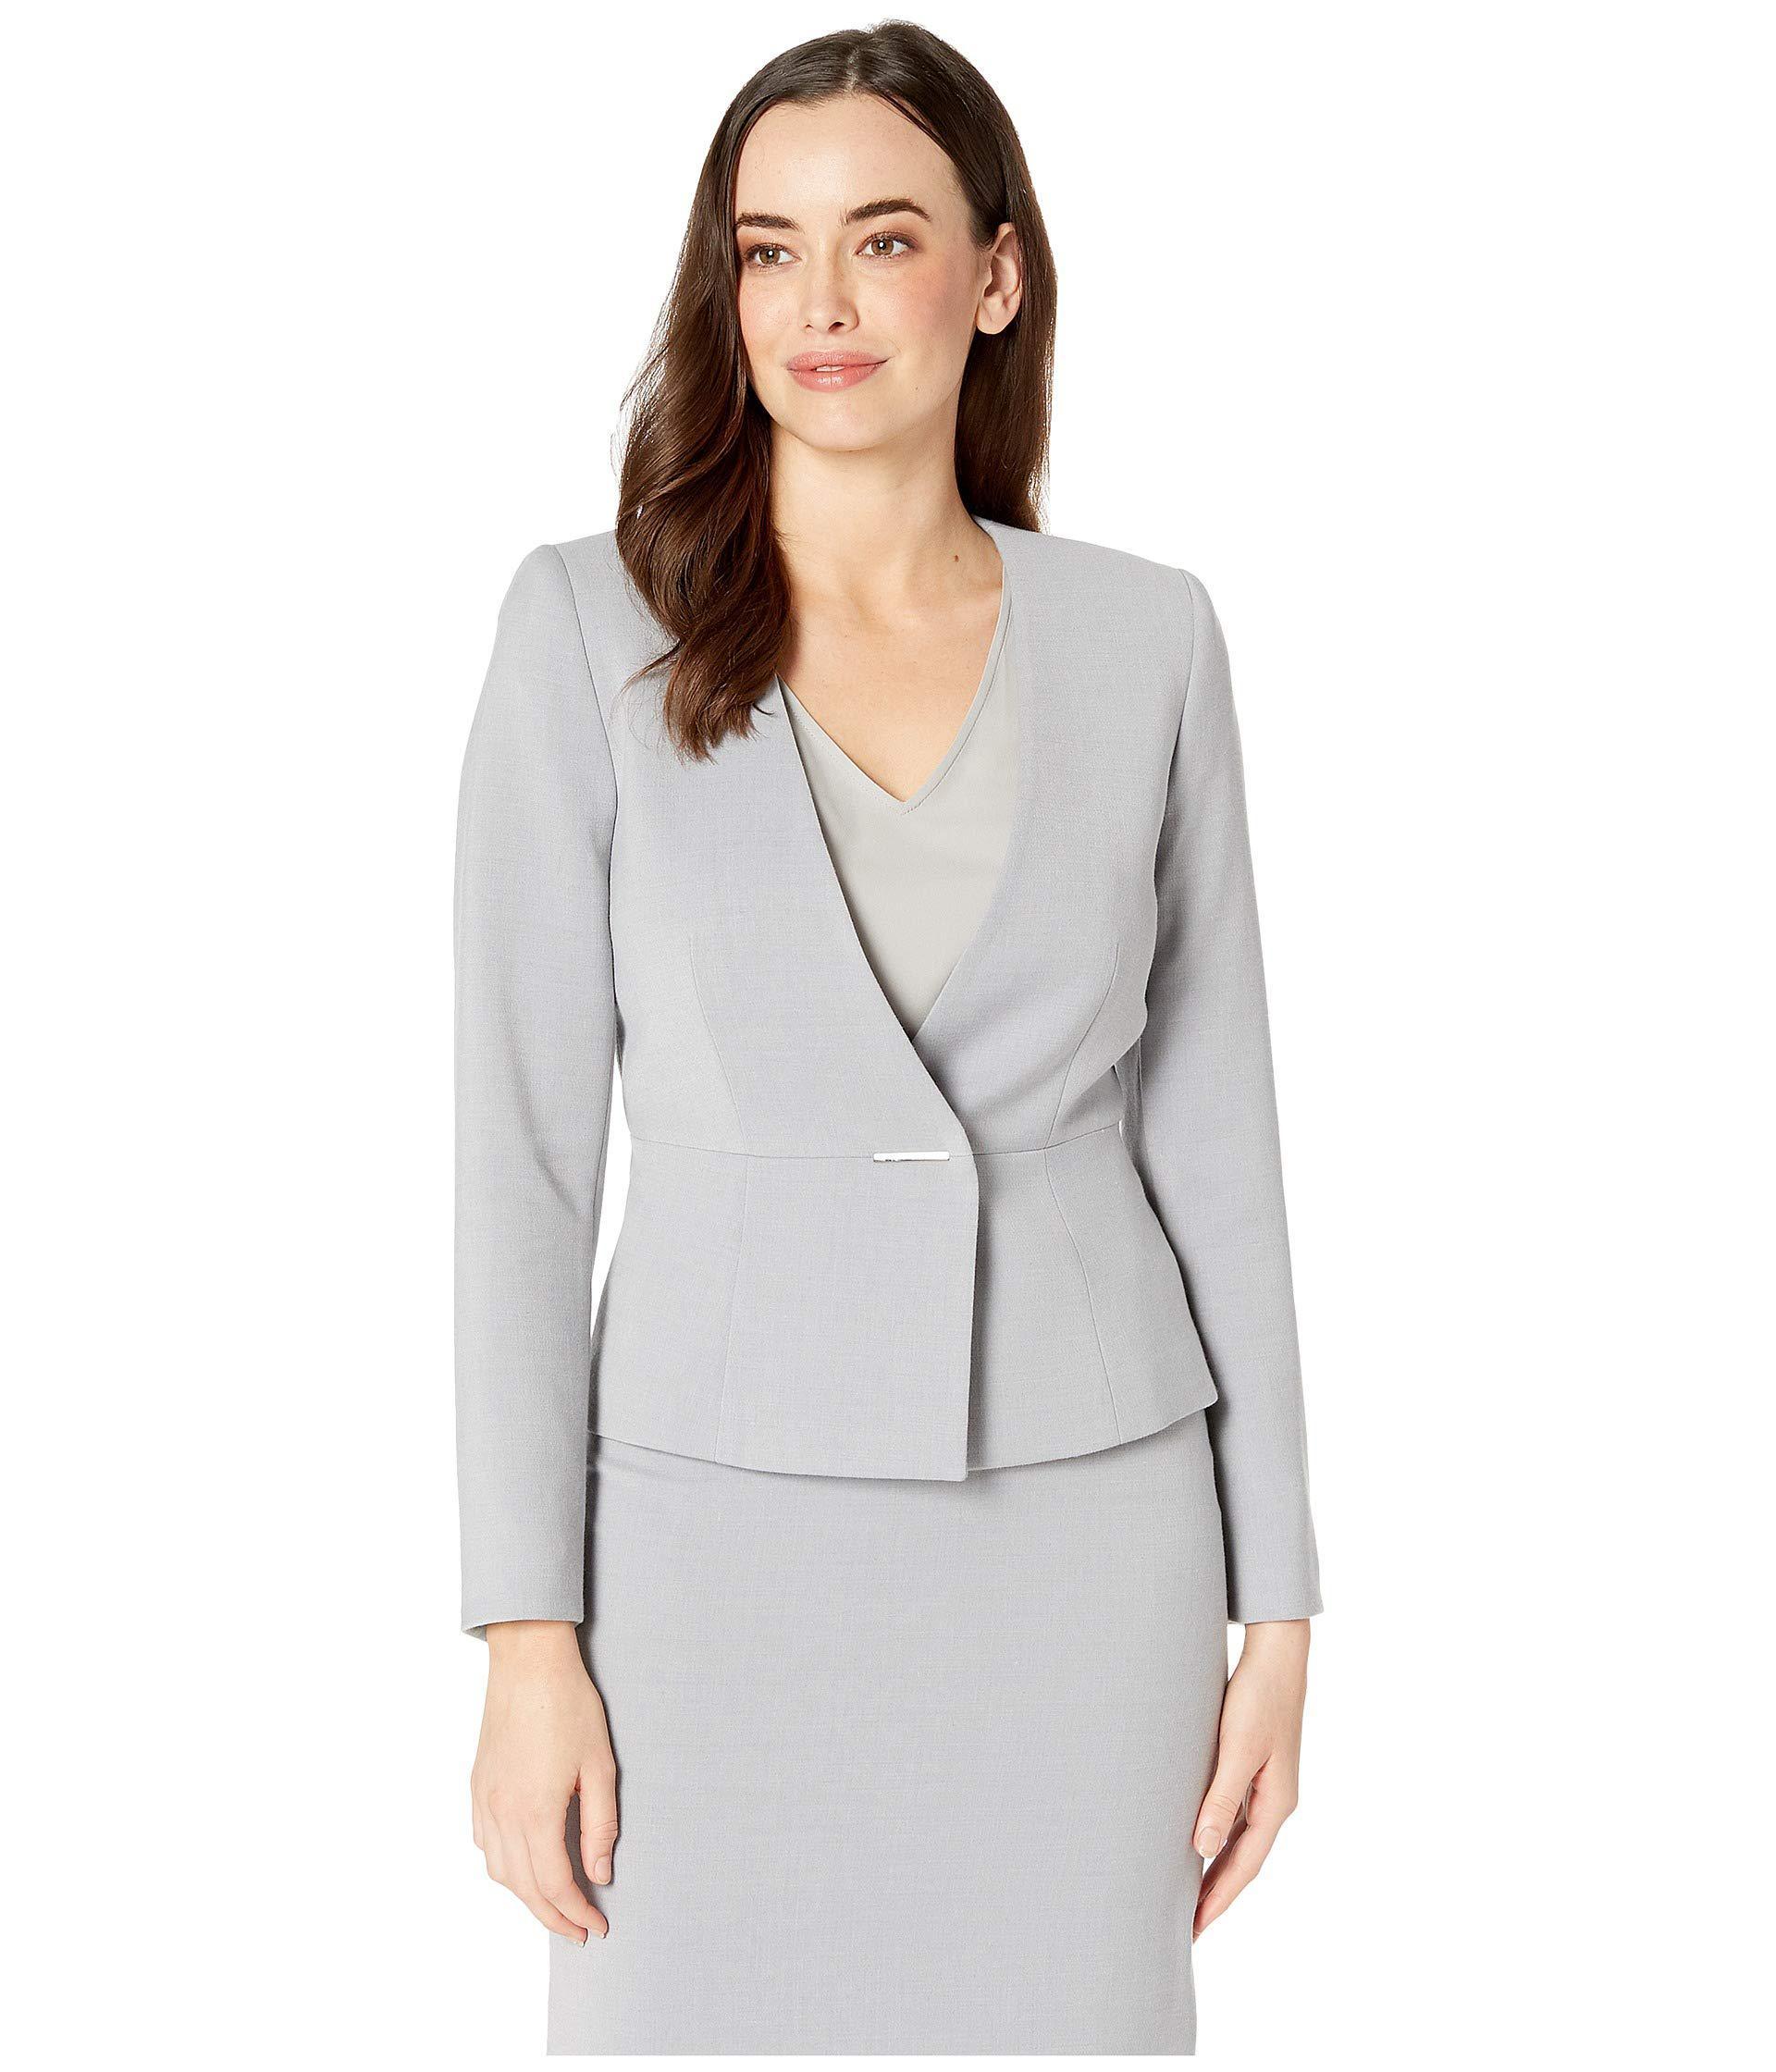 fcc27bcbd622a Tahari Collarless Bar Snap Closure Skirt Suit in Gray - Lyst